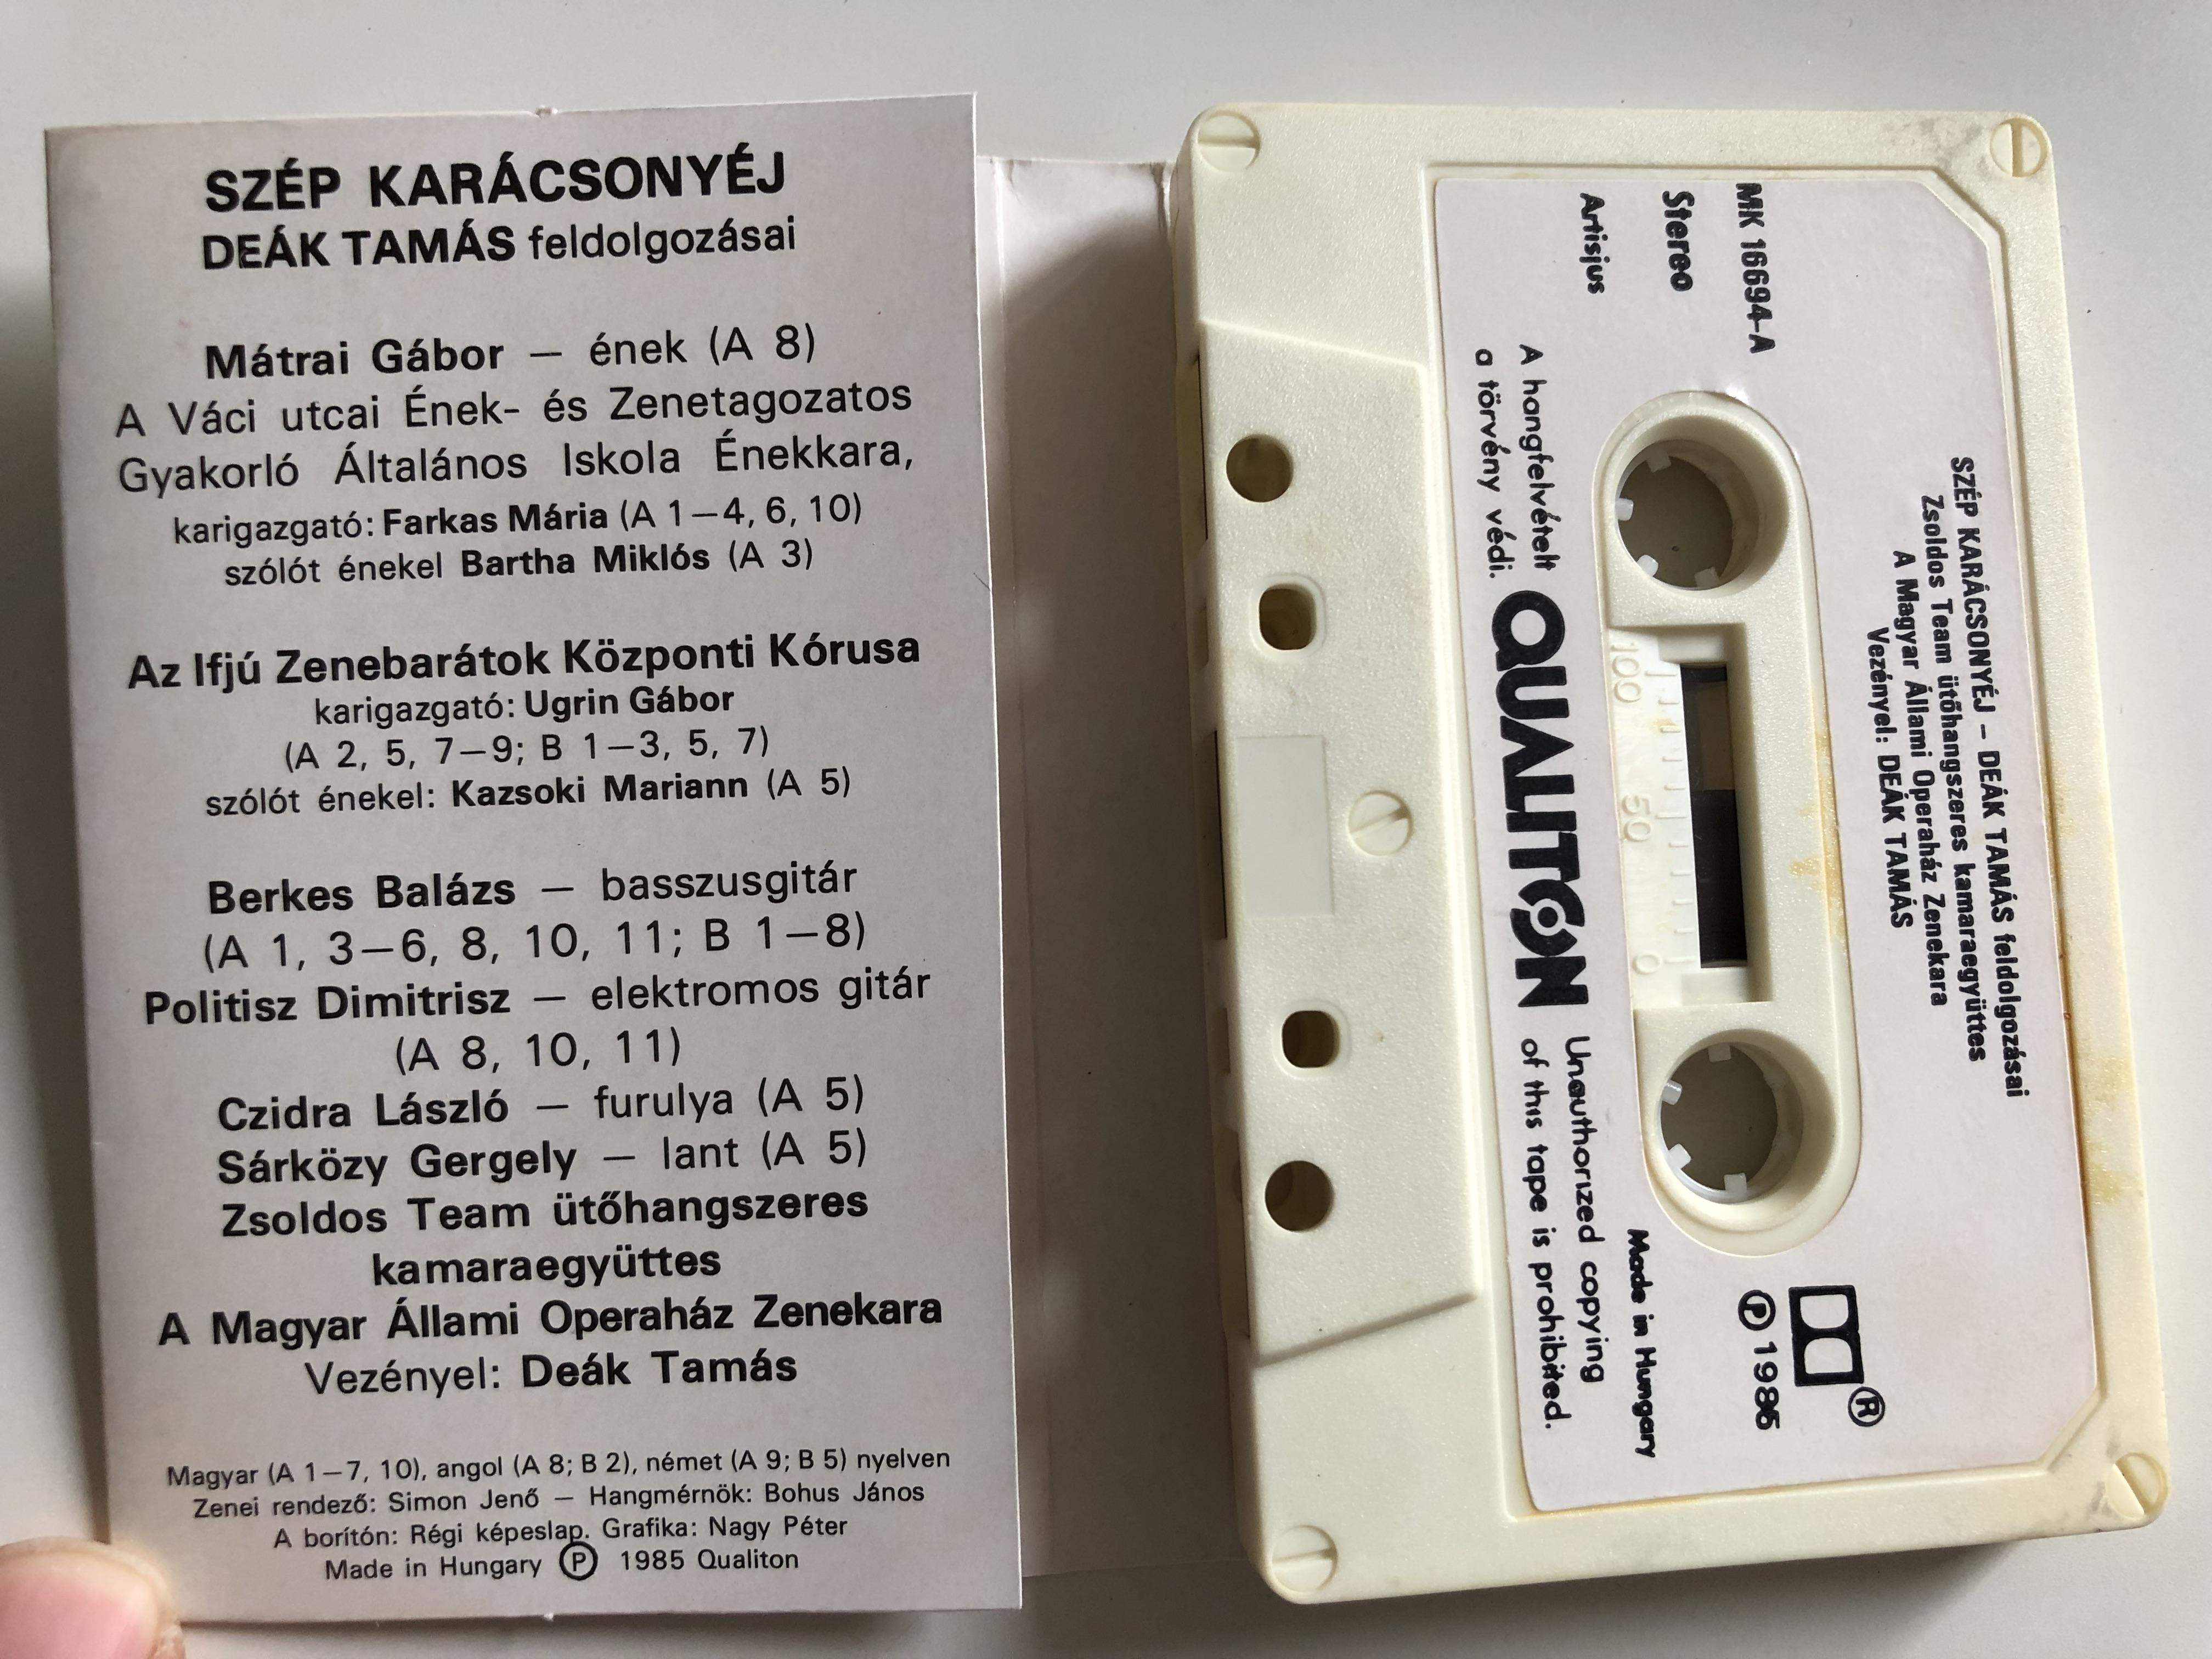 sz-p-kar-csony-j-nepszeru-karacsonyi-dallamok-de-k-tam-s-feldolgozasaban-qualiton-cassette-stereo-mk-16694-2-.jpg